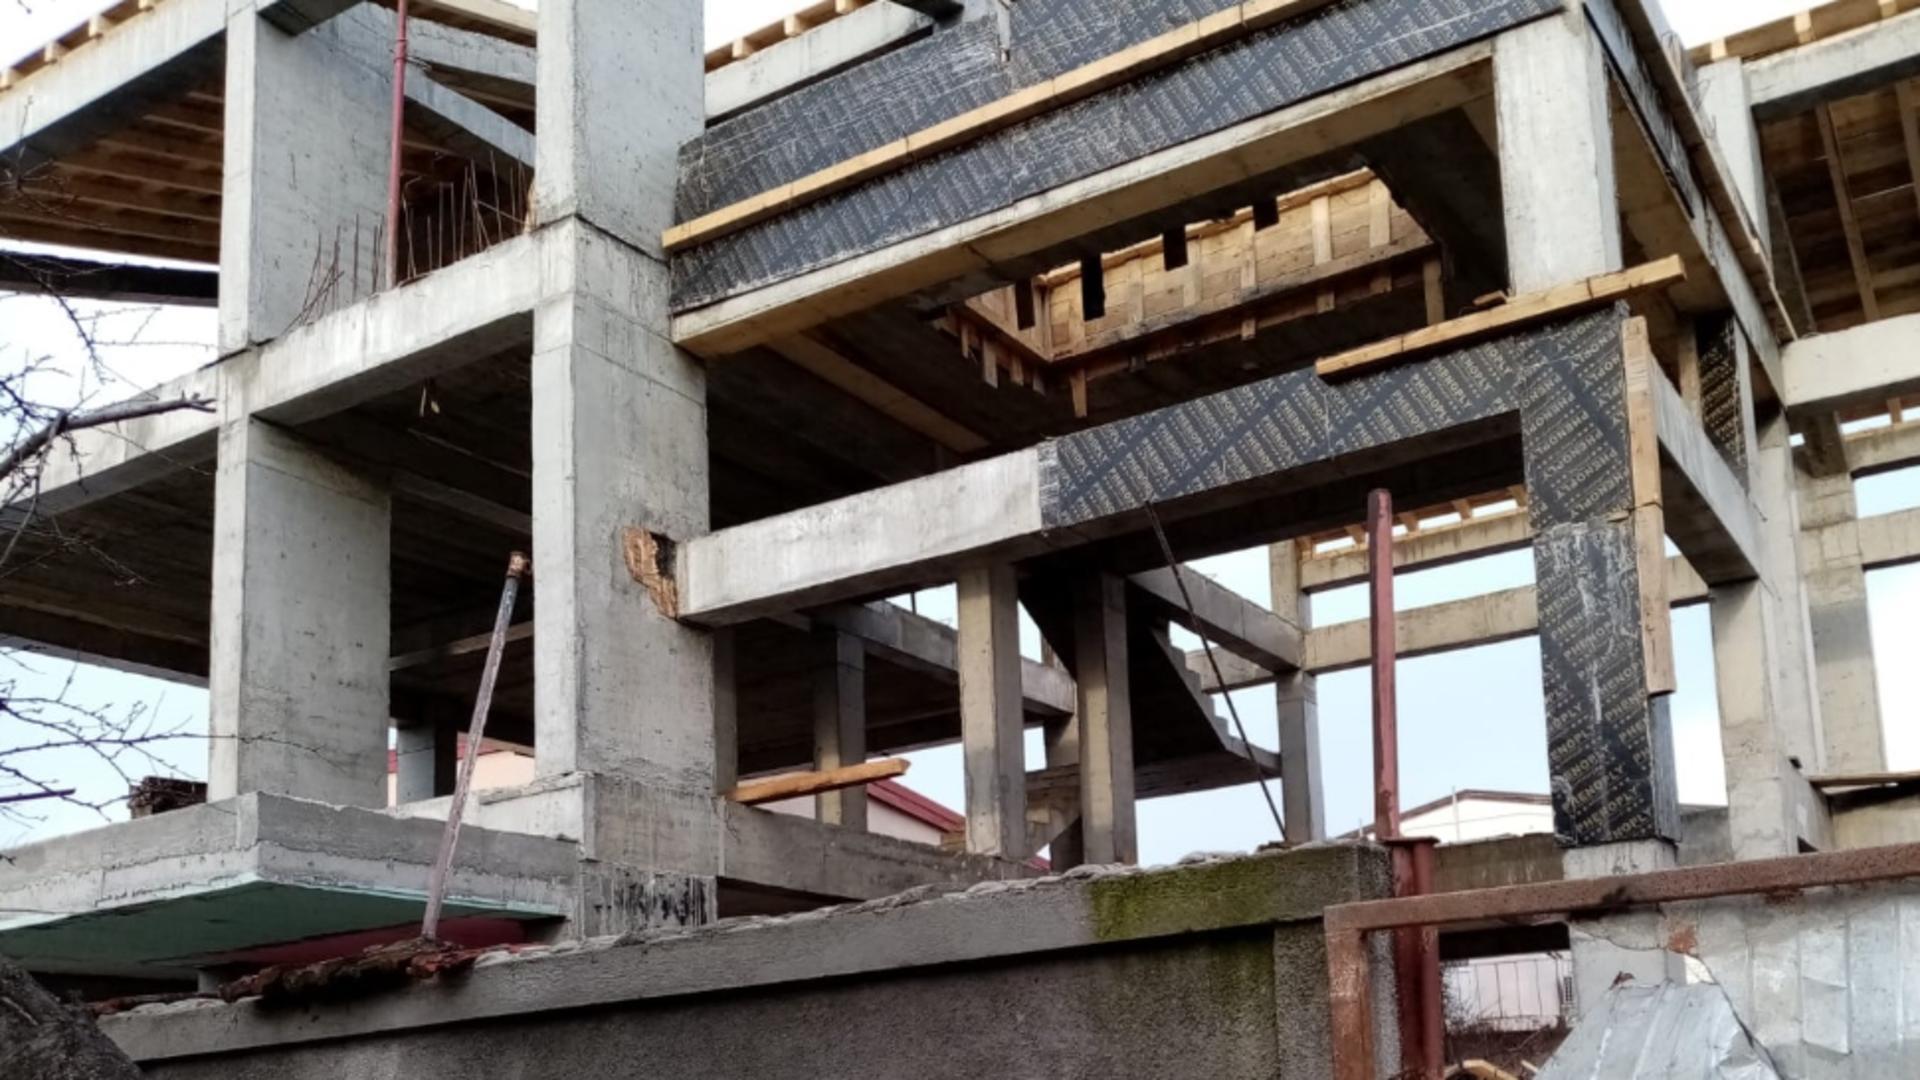 Imobil în construcție (foto: Emanuel Focșan)